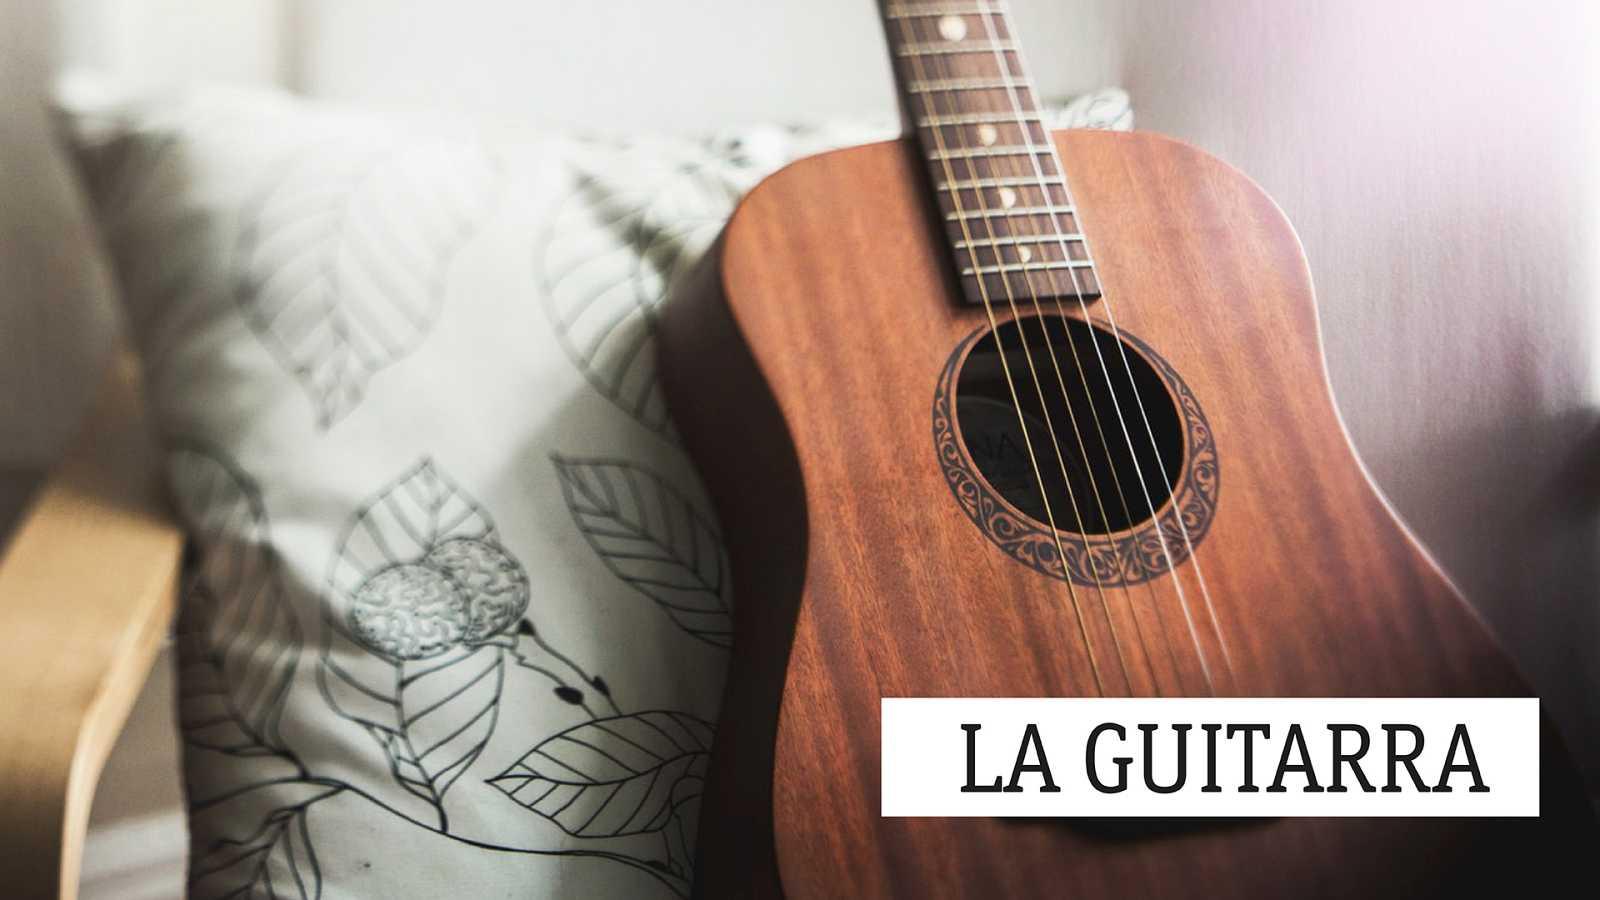 La guitarra - Suite de homenajes - 01/11/20 - escuchar ahora